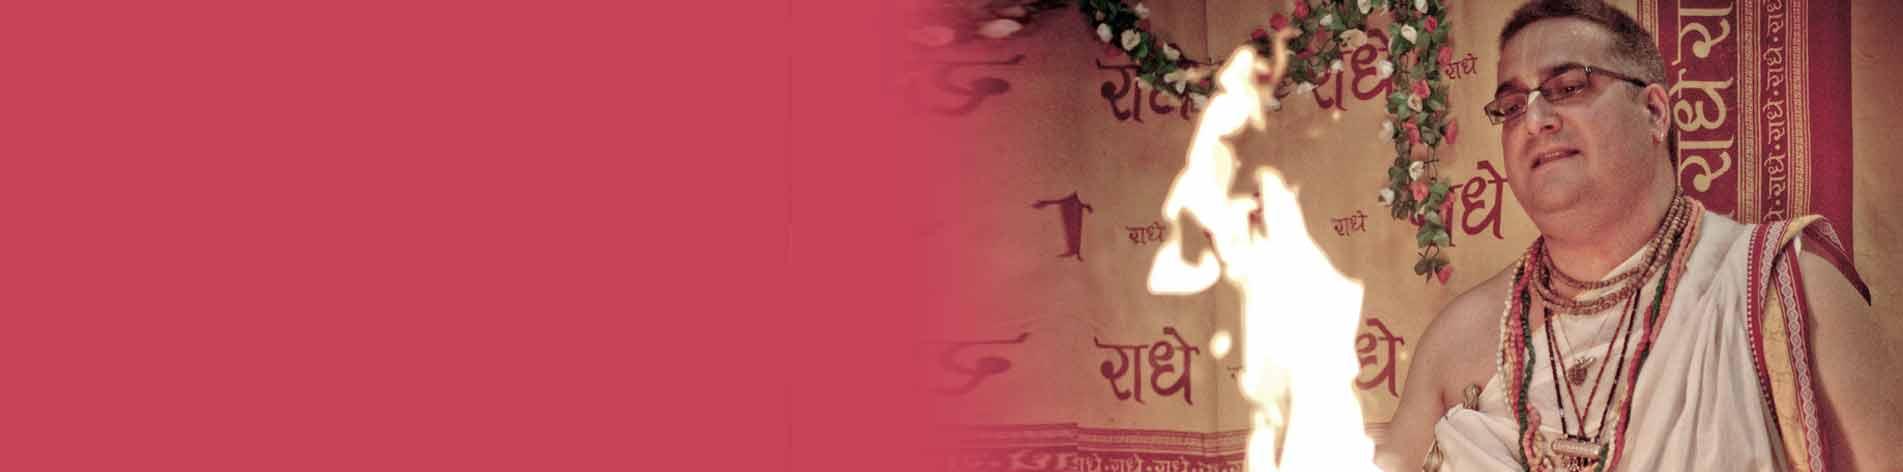 Krishna Kripa Dasa